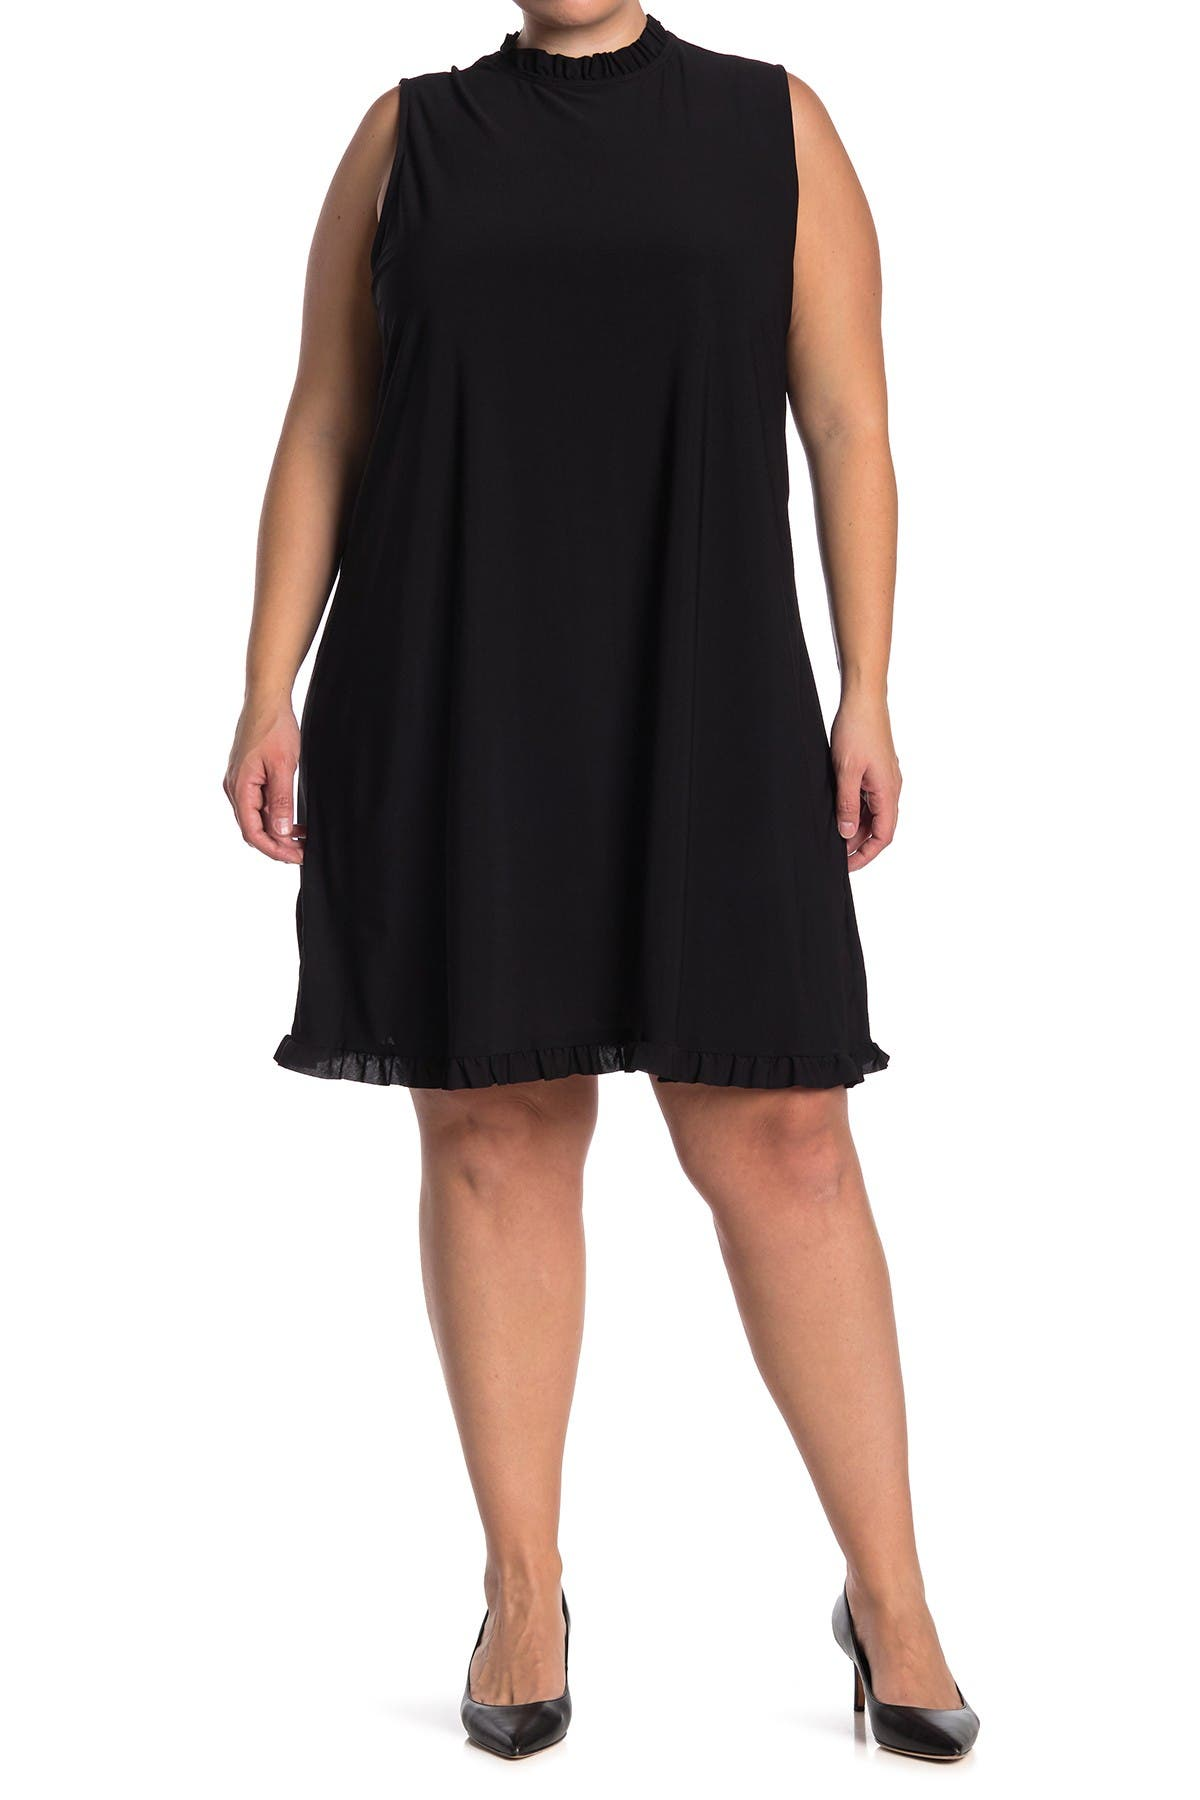 Image of TASH + SOPHIE Ruffle Trim Sleeveless Shift Dress